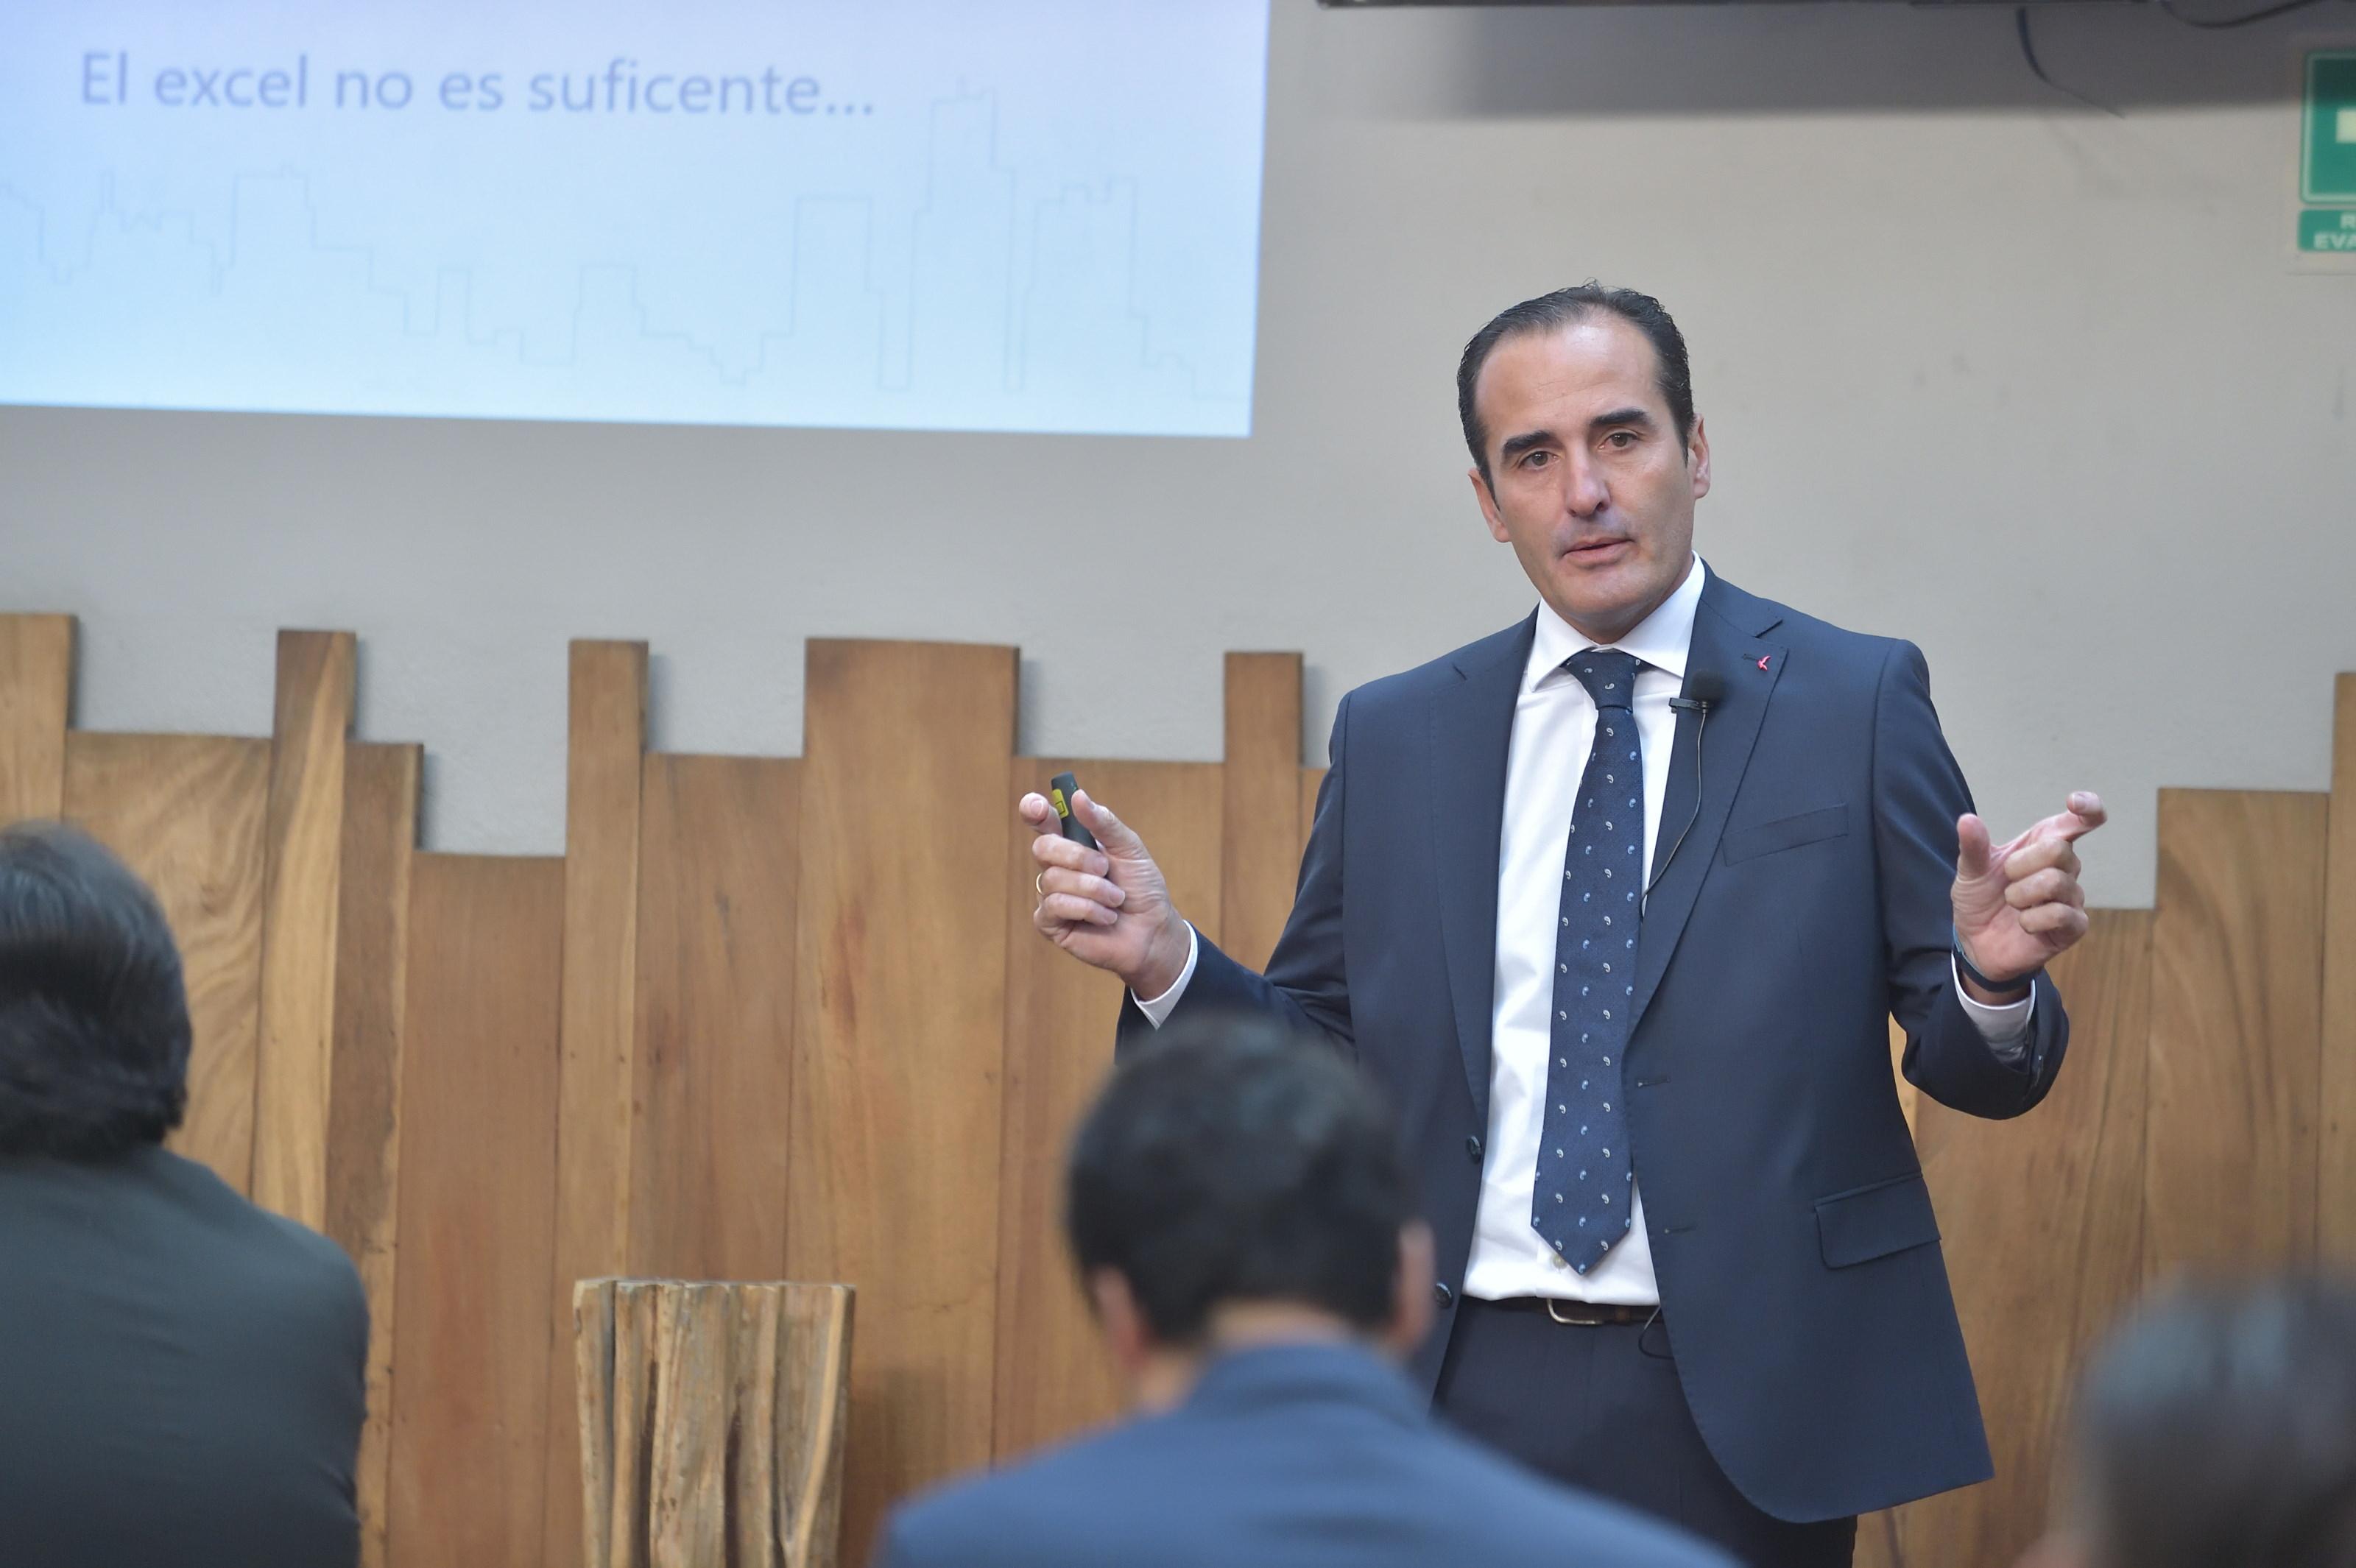 Antonio-Quevedo-CEO-GlobalSUITE.jpg